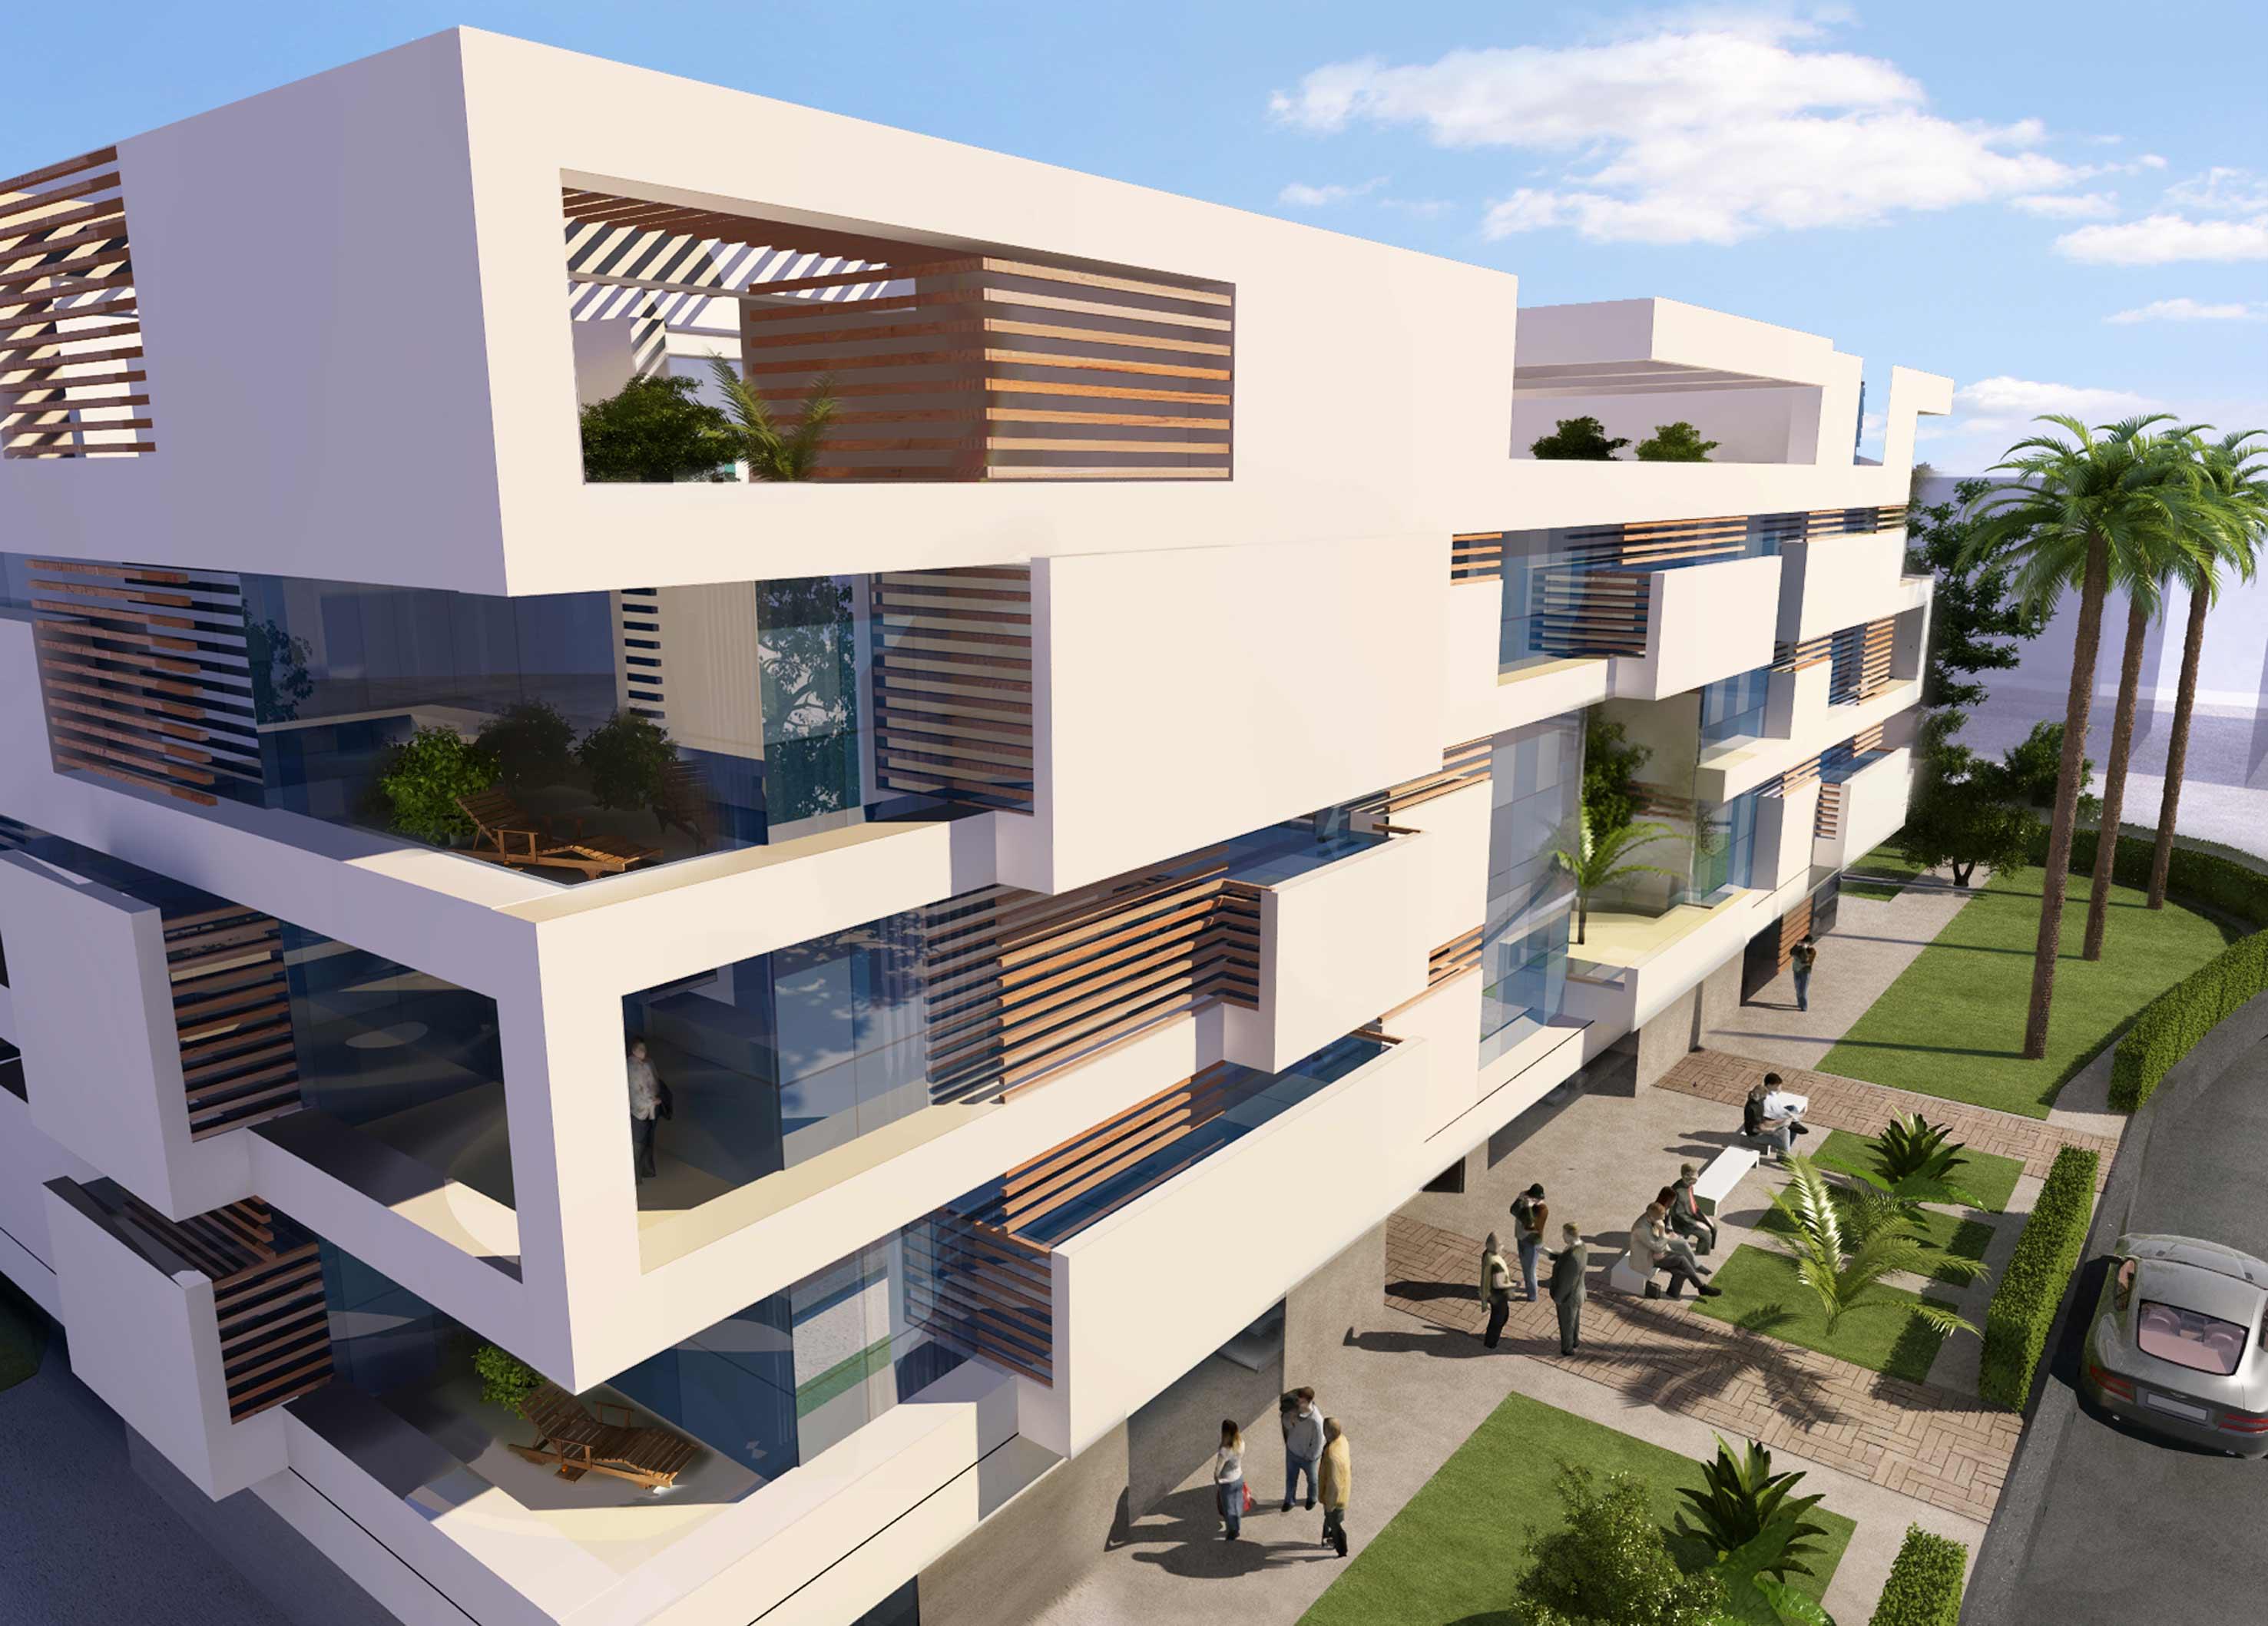 block 36 shahira h fahmy architects archello. Black Bedroom Furniture Sets. Home Design Ideas